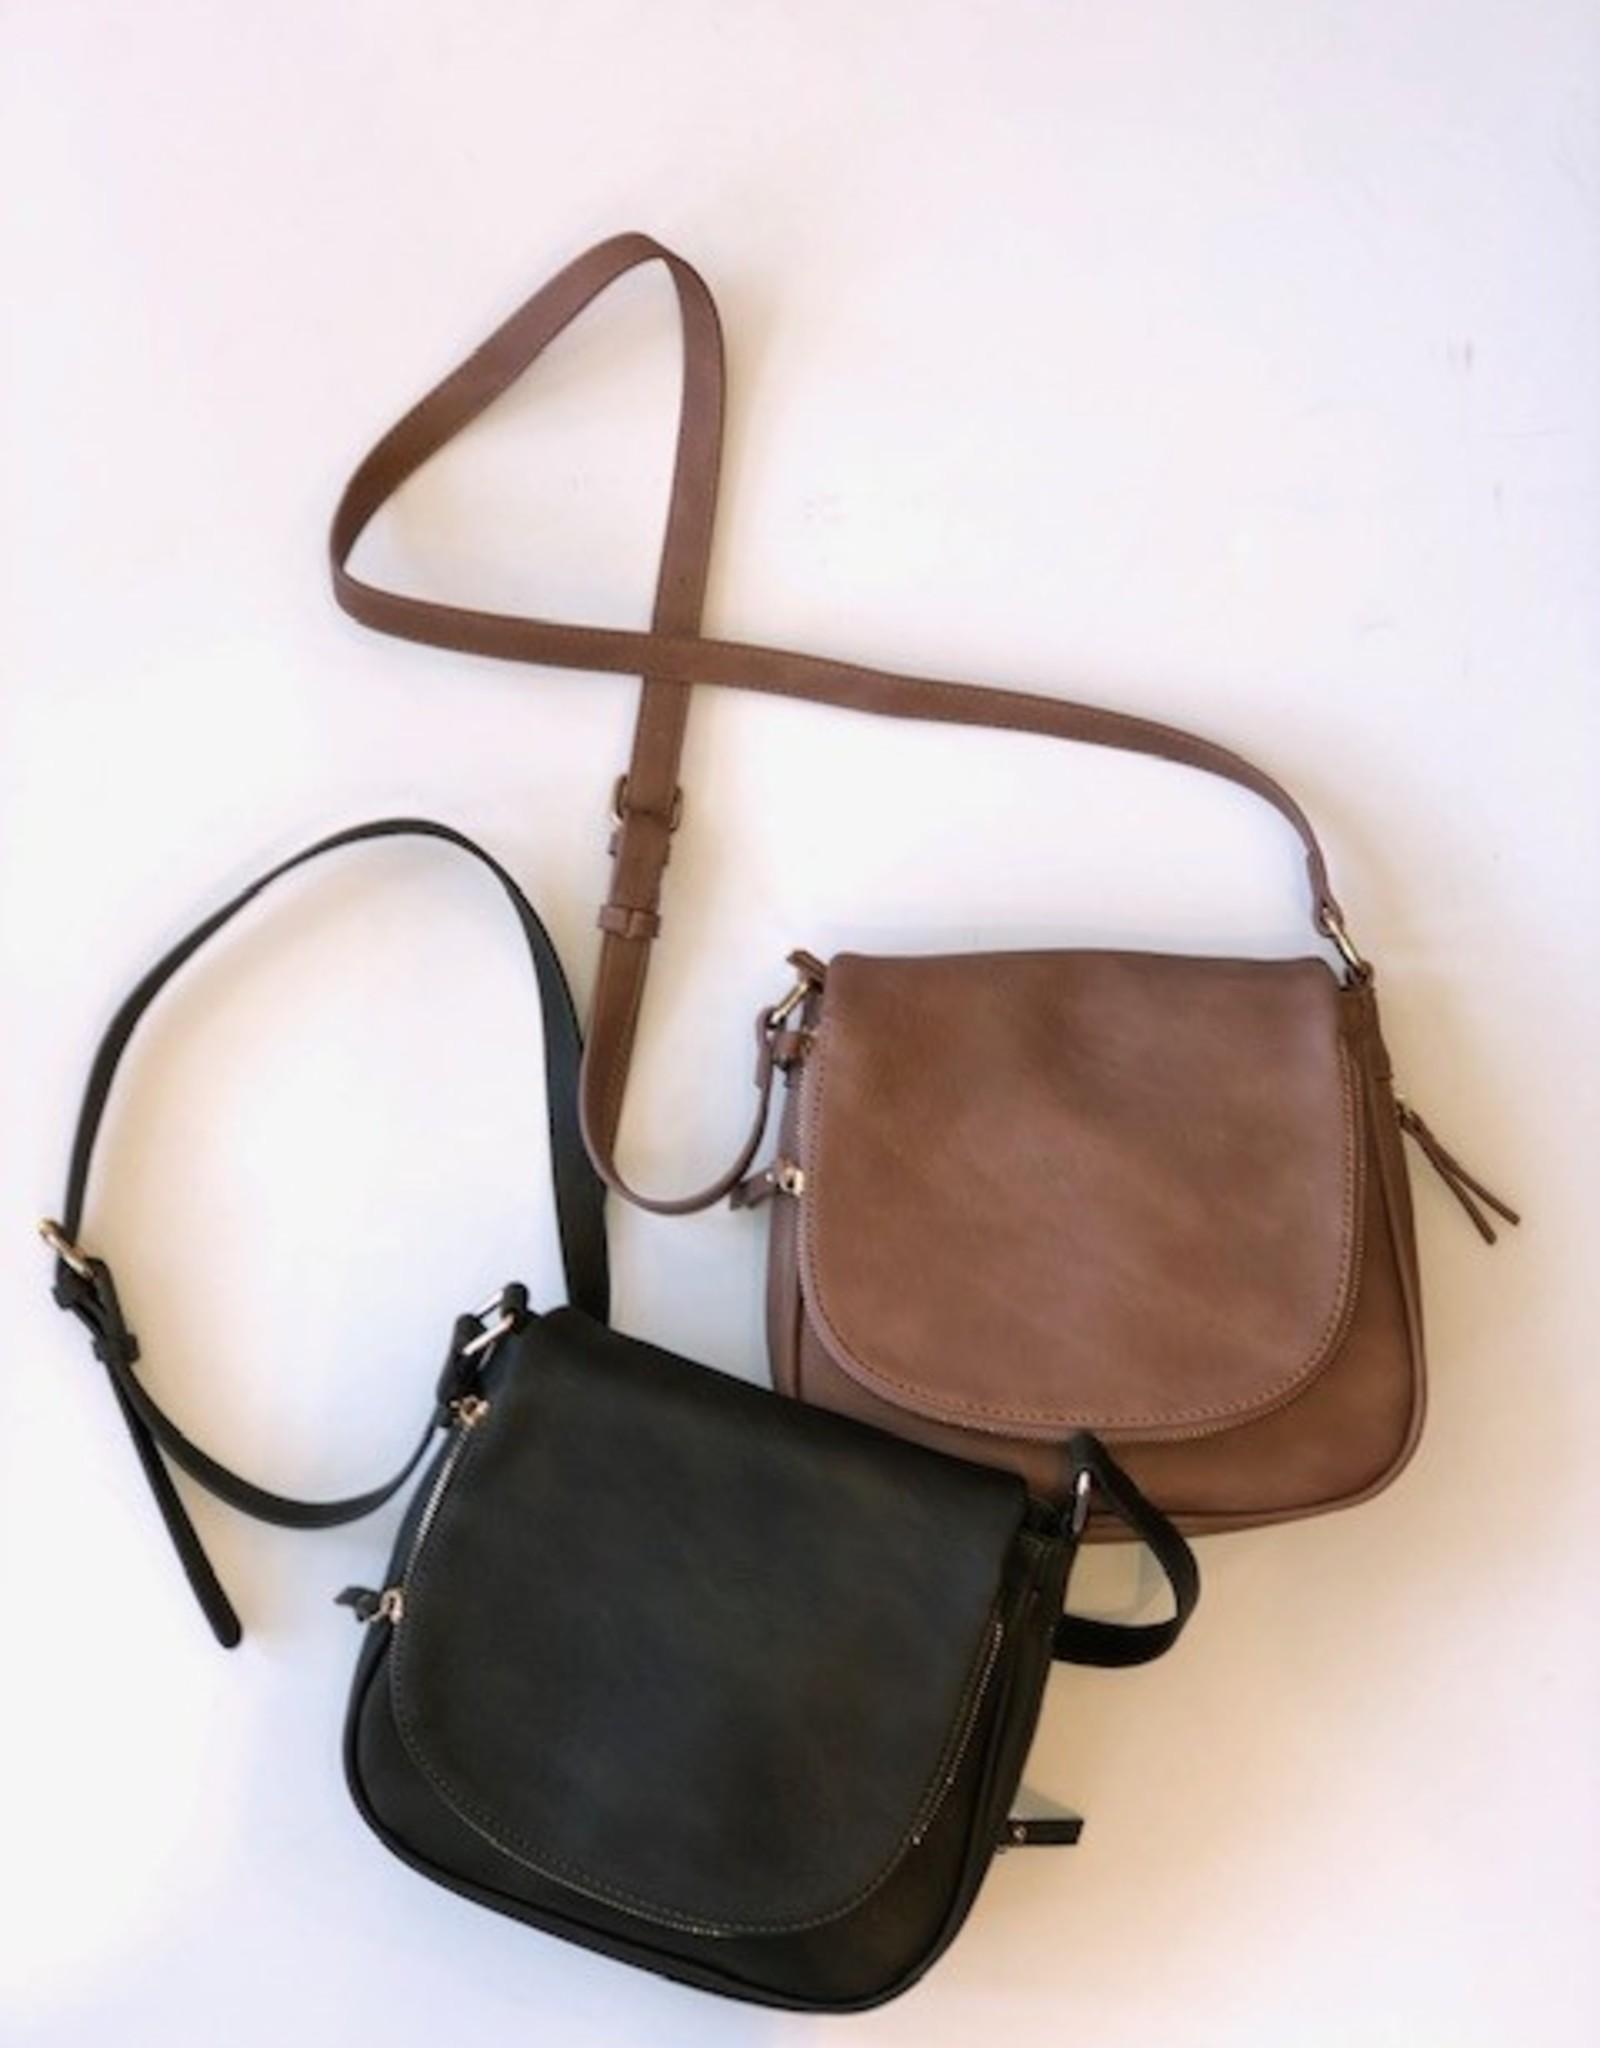 DT Cross Body Vegan Leather Bag